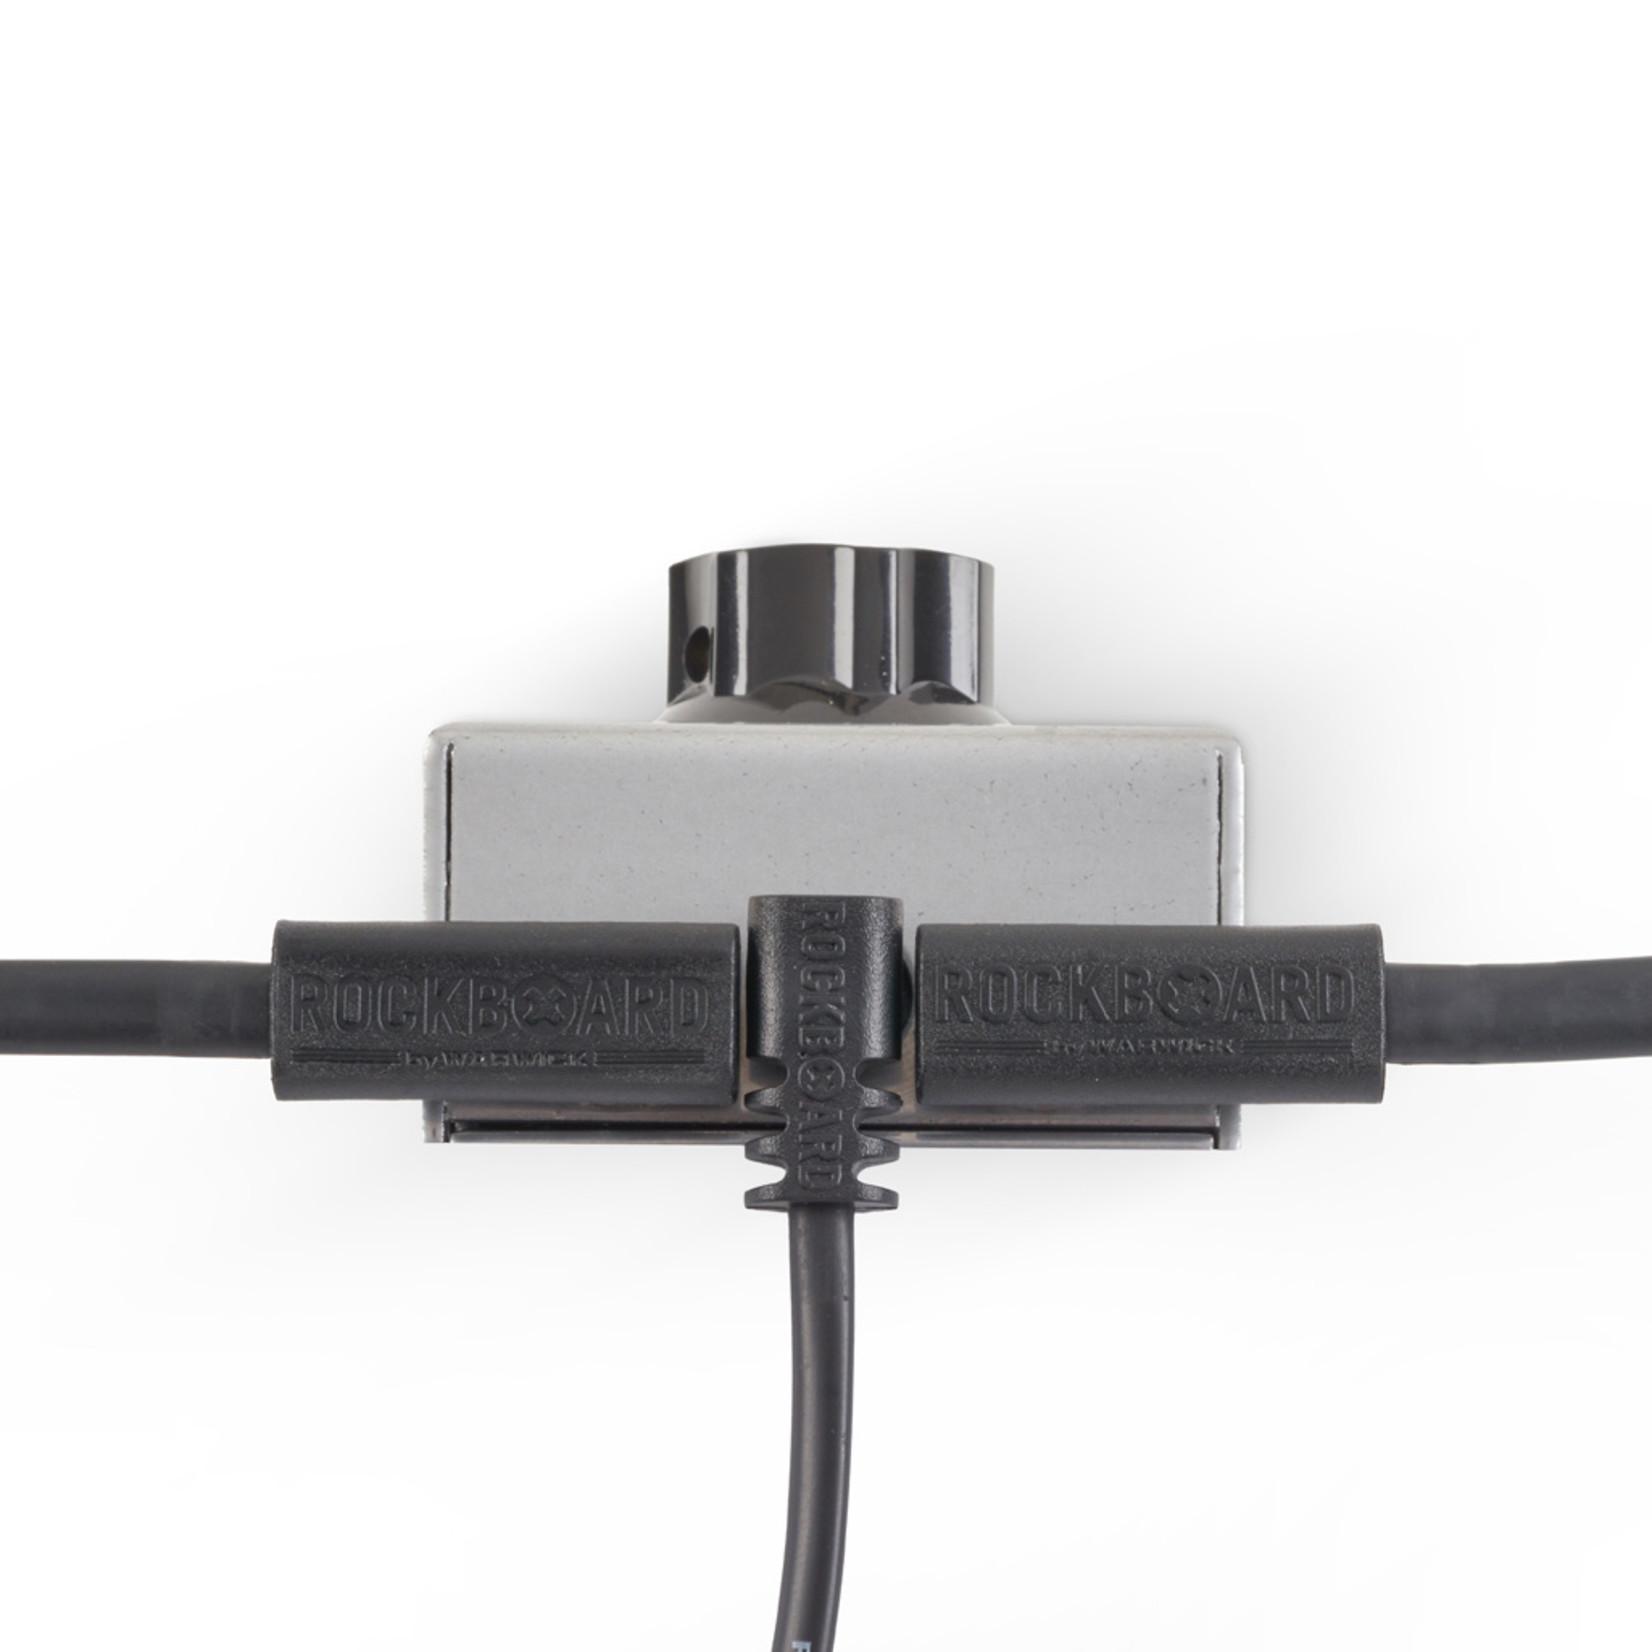 "Rockboard RockBoard Flat Power Cable - Angled/Angled - 30 cm / 11 13/16"""